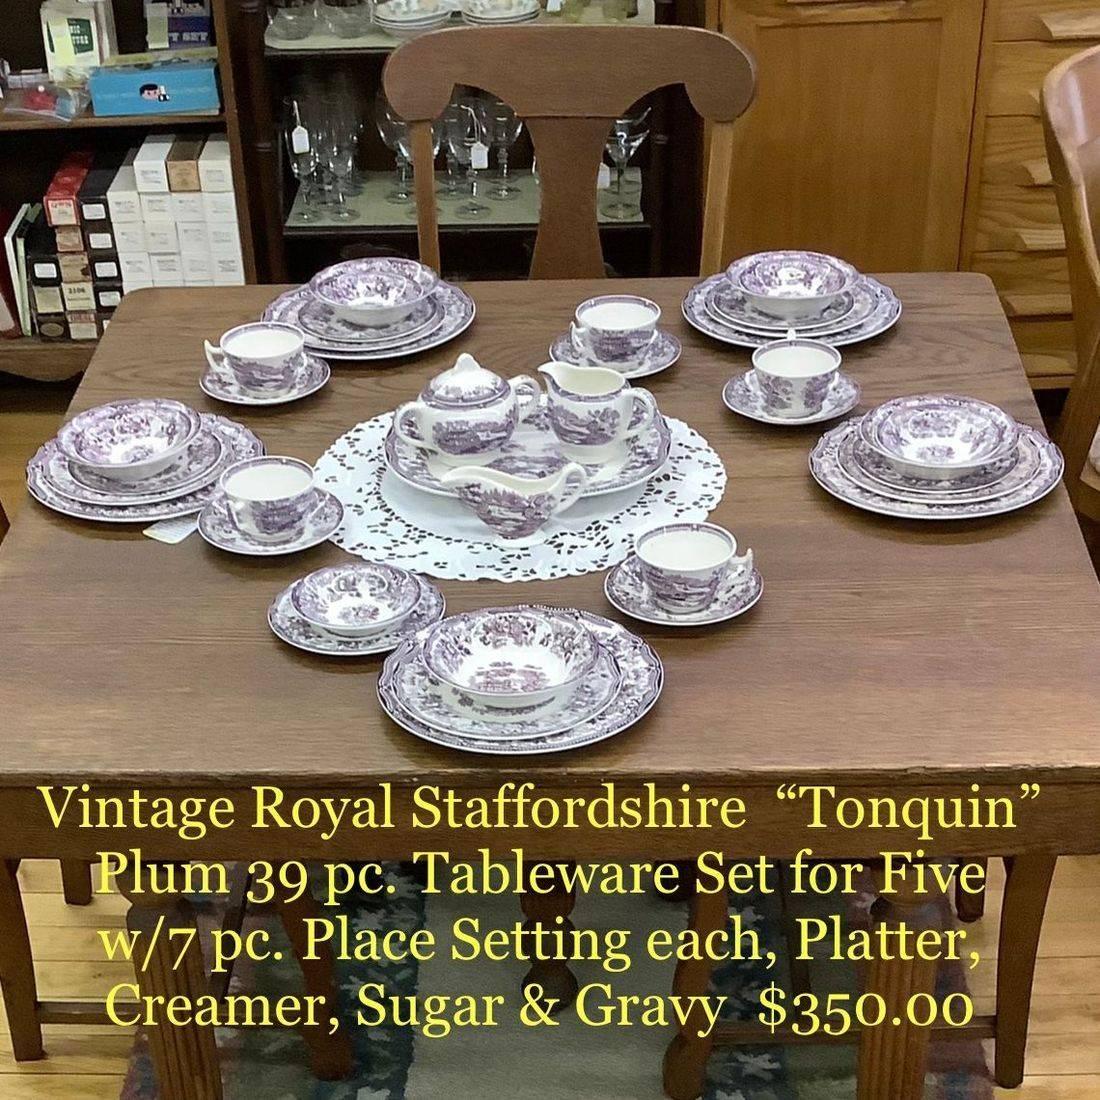 "Vintage Royal Staffordshire ""Tonquin"" Plum 39 pc. Tableware Set for Five   $350.00"